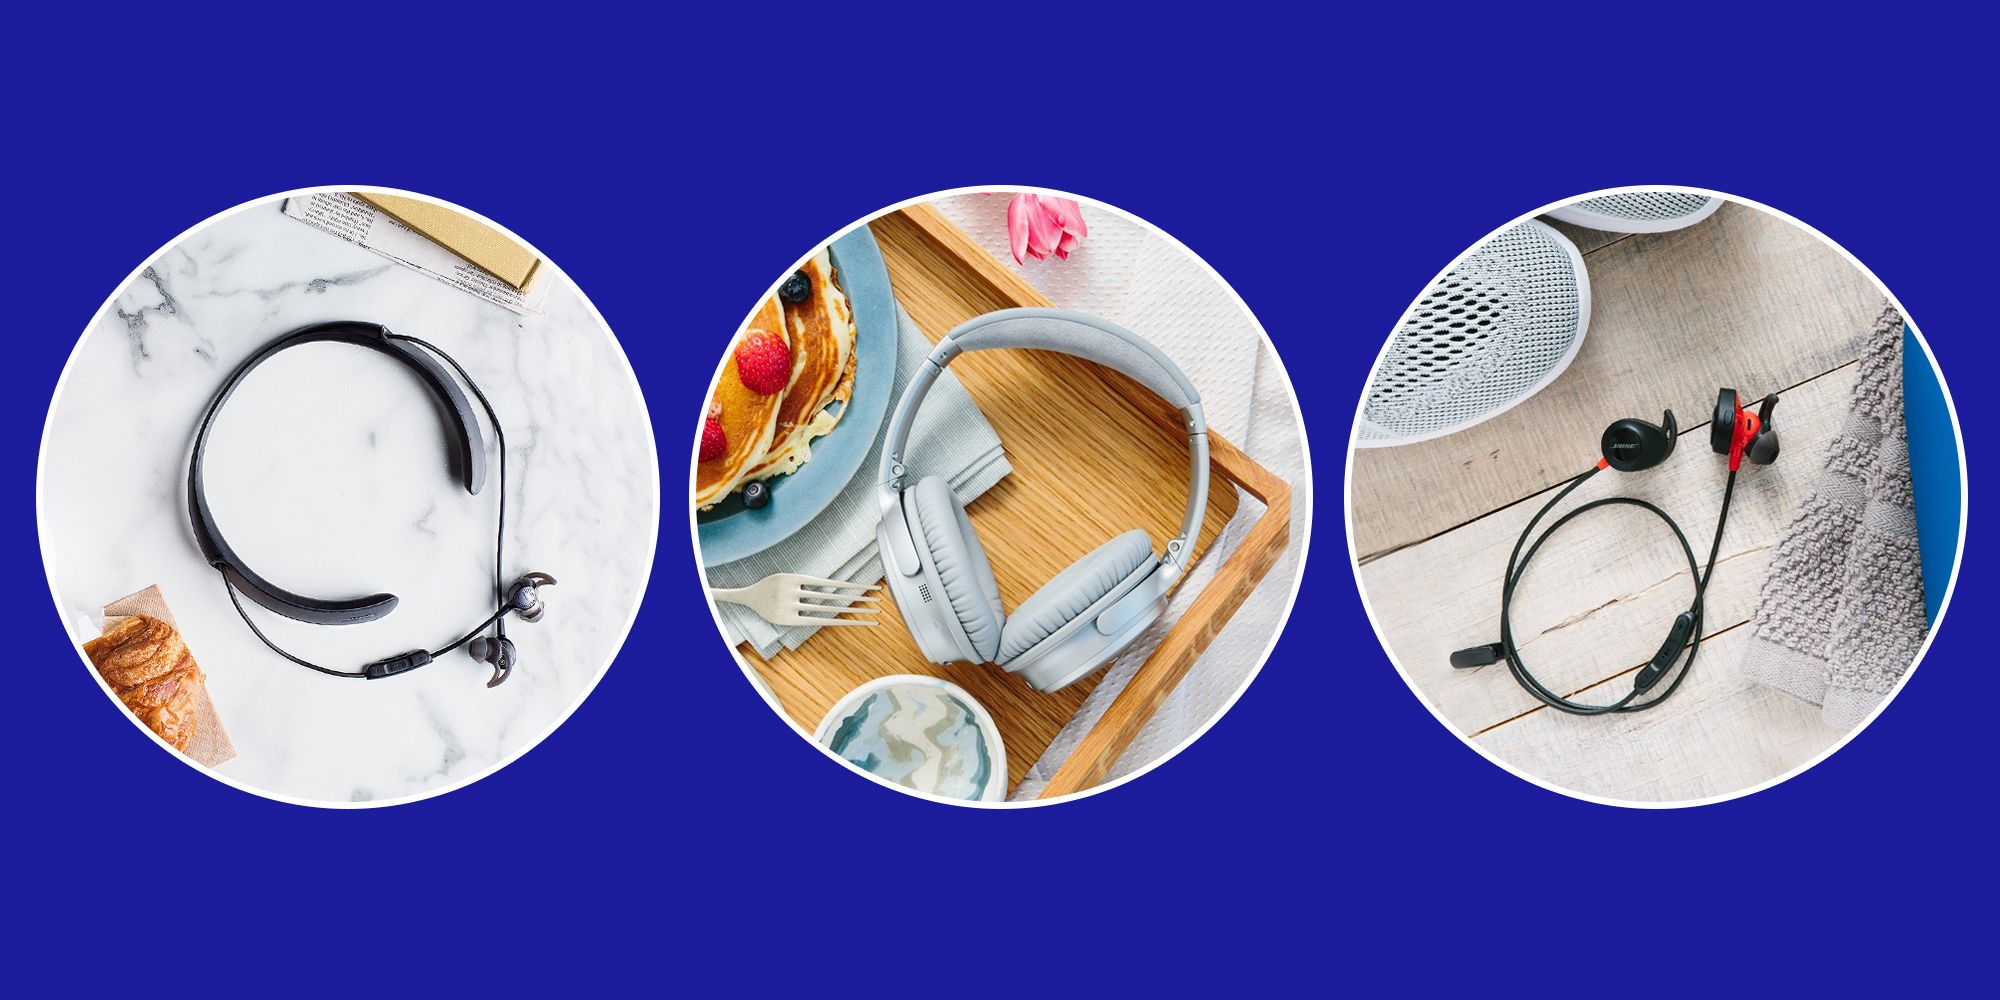 11 Best Bose Headphones In 2018 Earbuds And Wireless Soundsport Free Earphone Navy Headphone Reviews